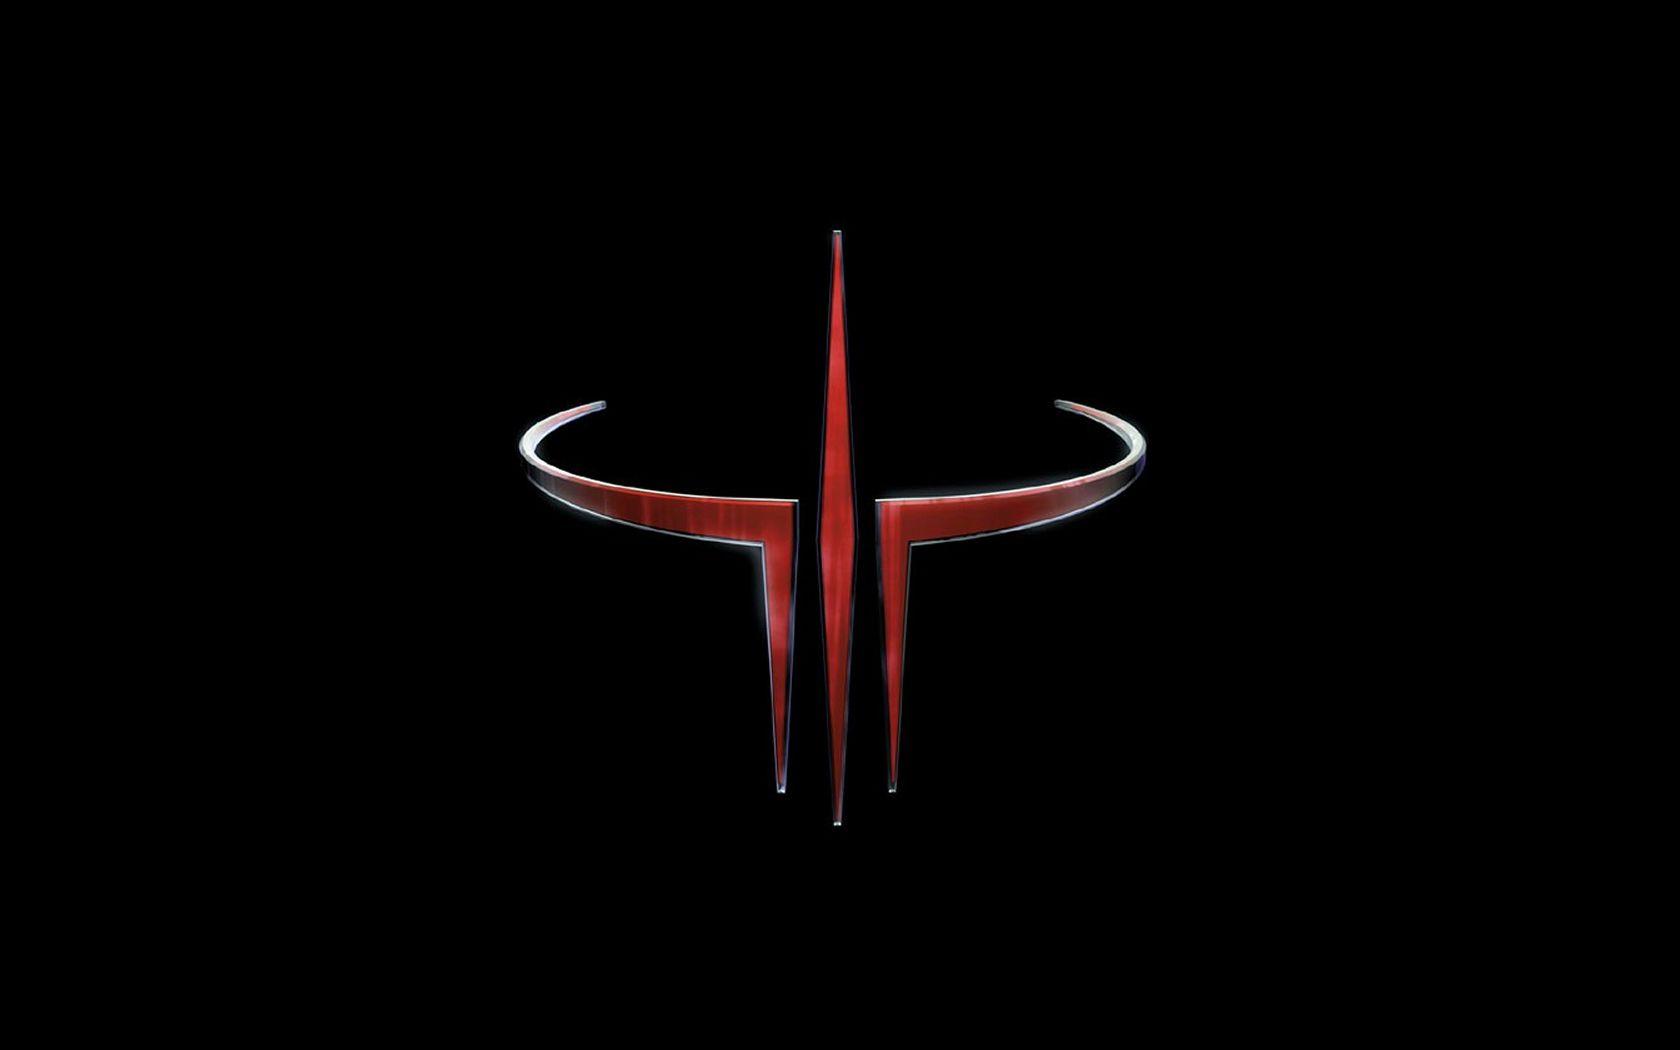 Quake Champions Game Wallpapers Logo Wallpaper Hd Wallpaper Hd Wallpaper Desktop